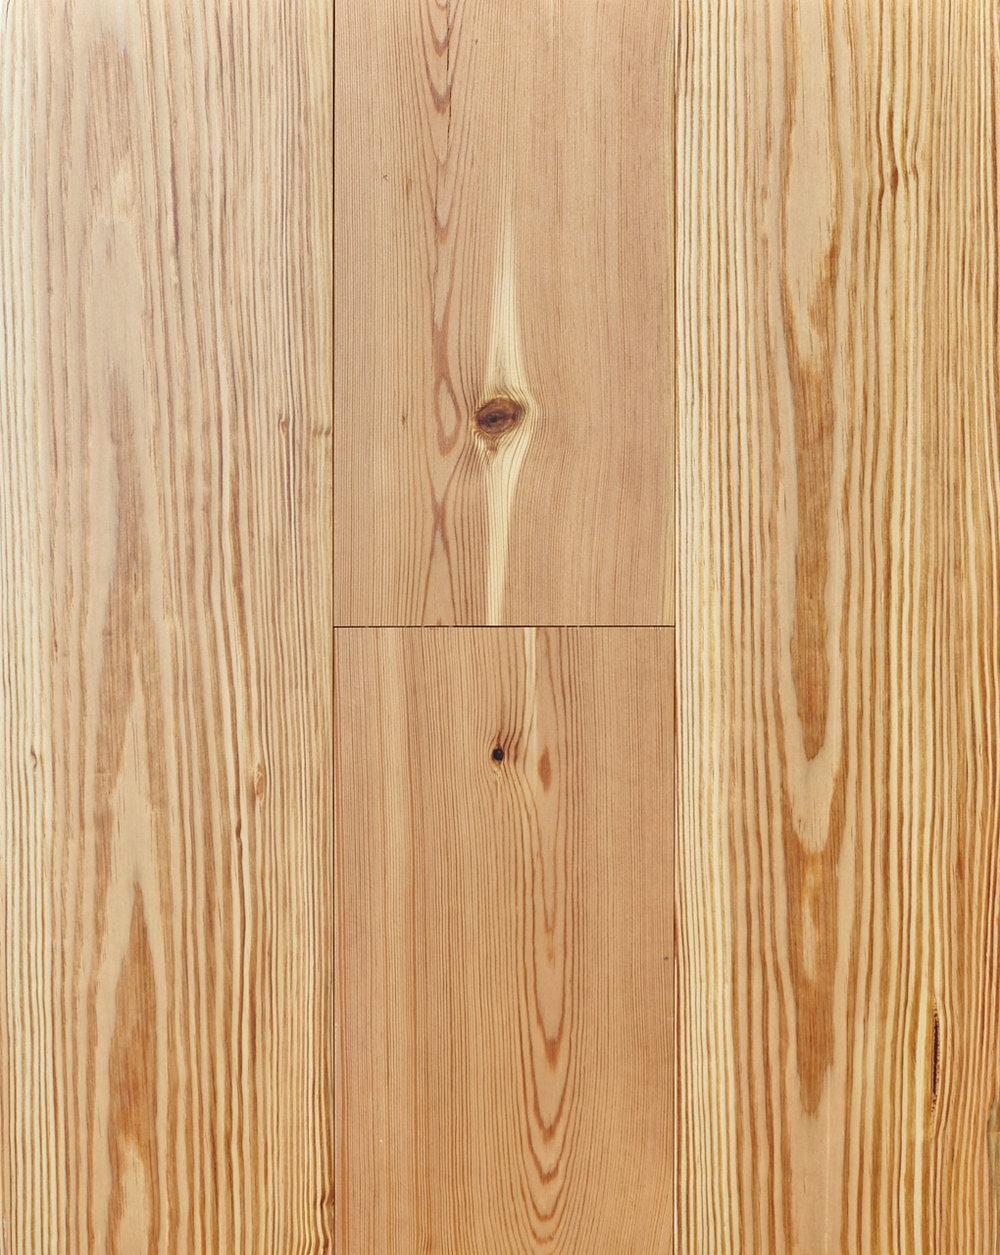 Barley-Reclaimed Heart Pine.jpg